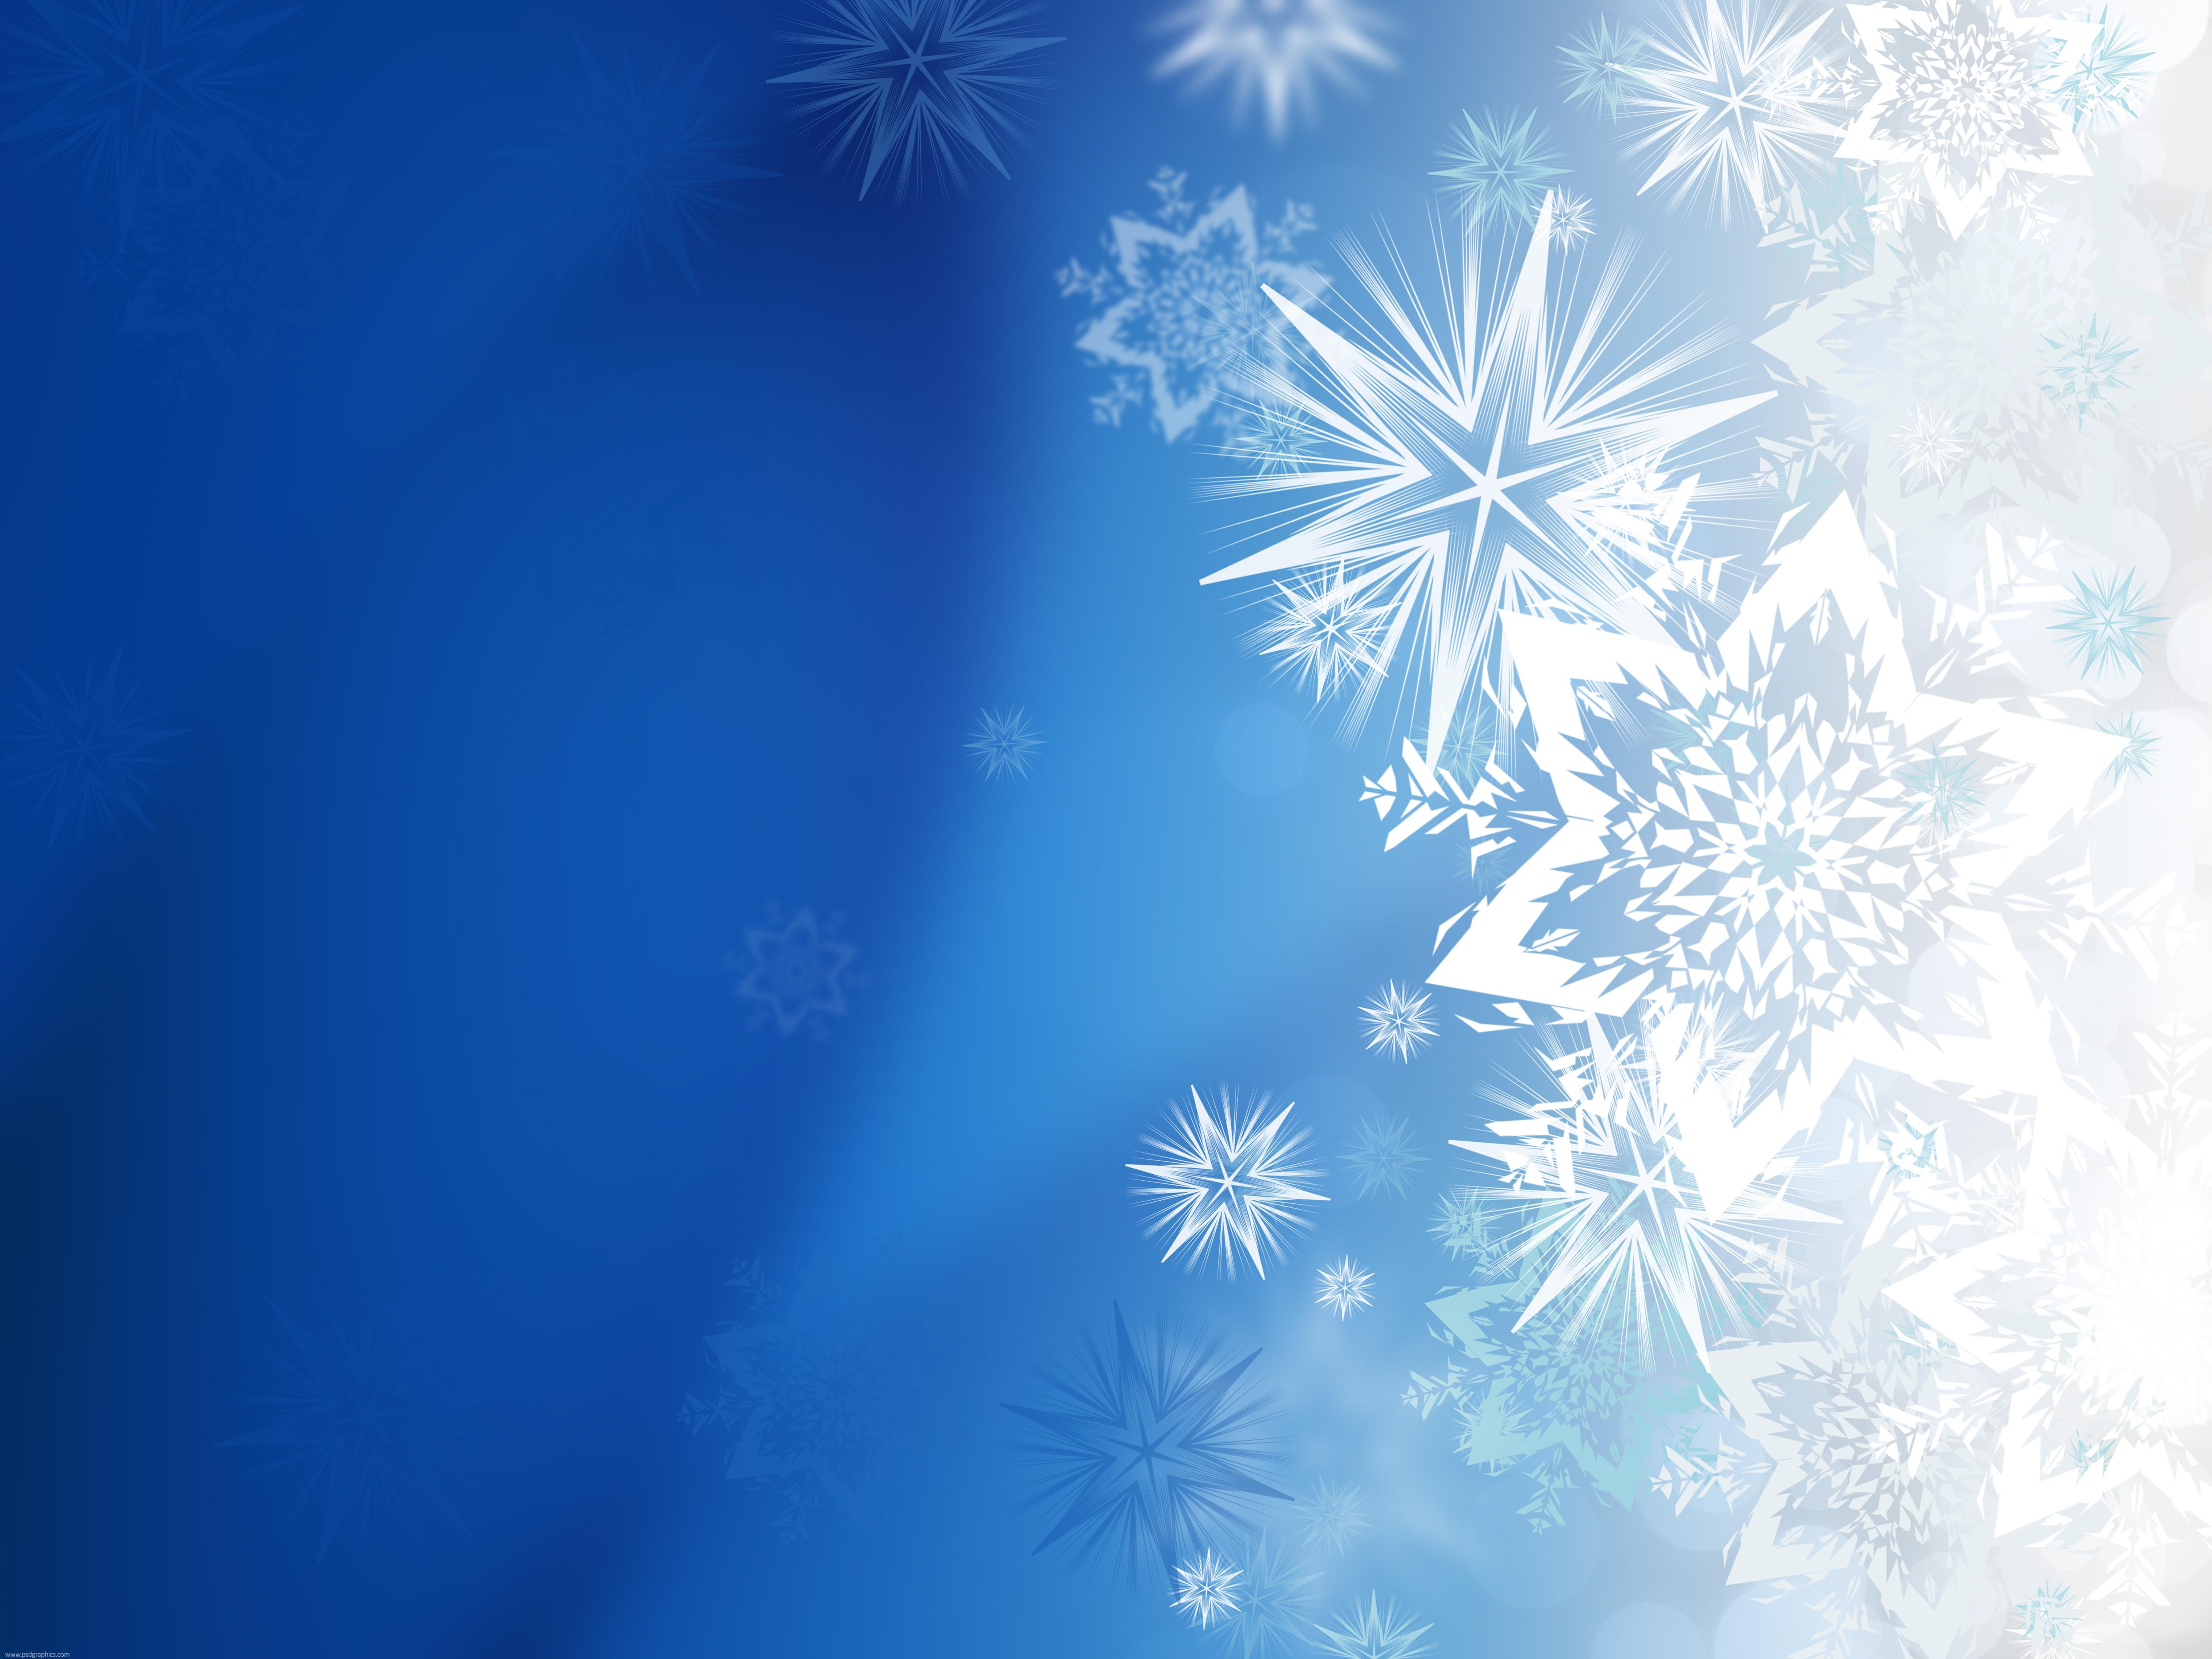 Winter Images Background - WallpaperSafari